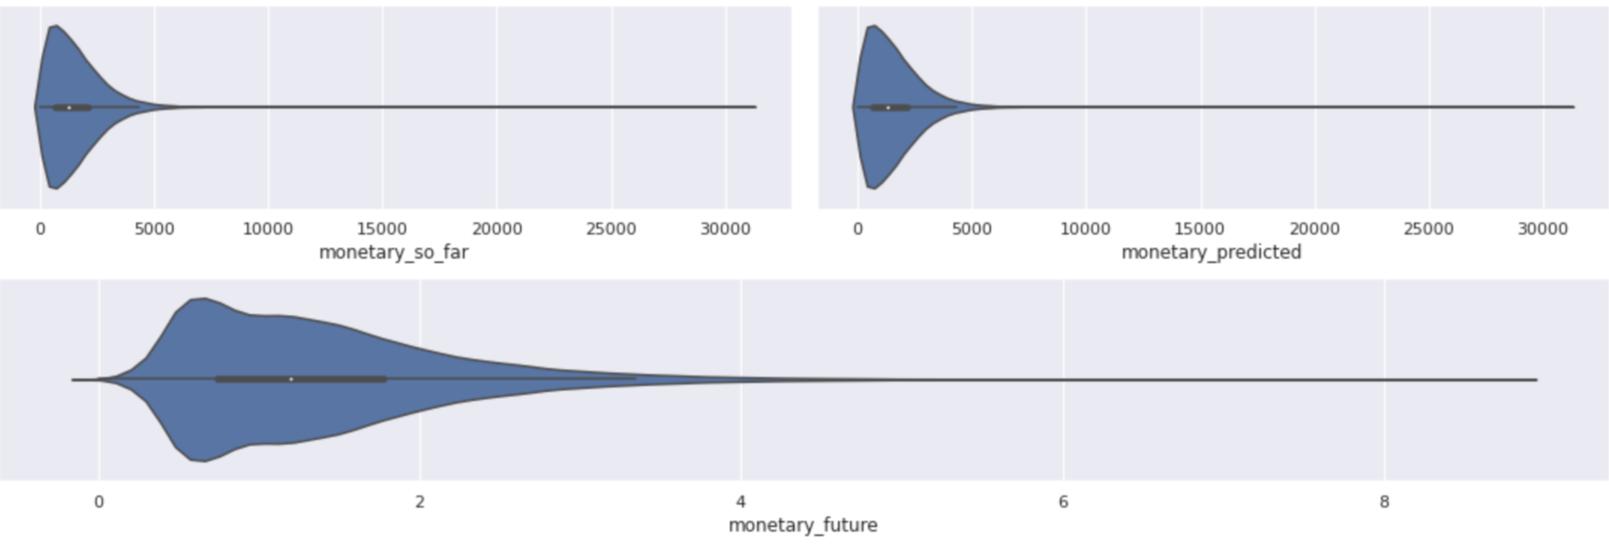 Visualization of prediction data distribution.